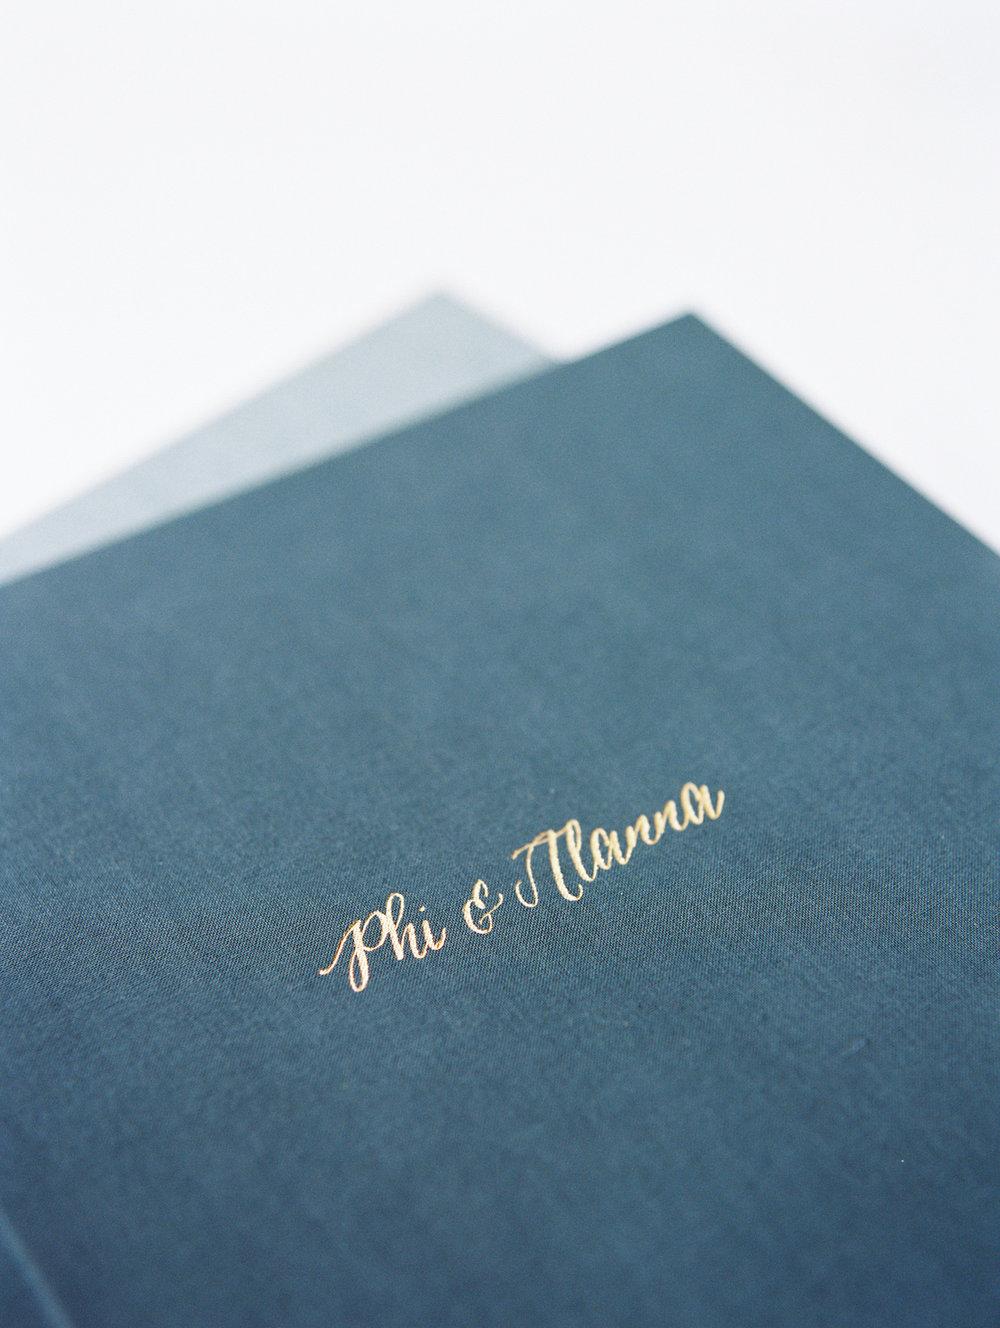 czar goss wedding albums-6.jpg